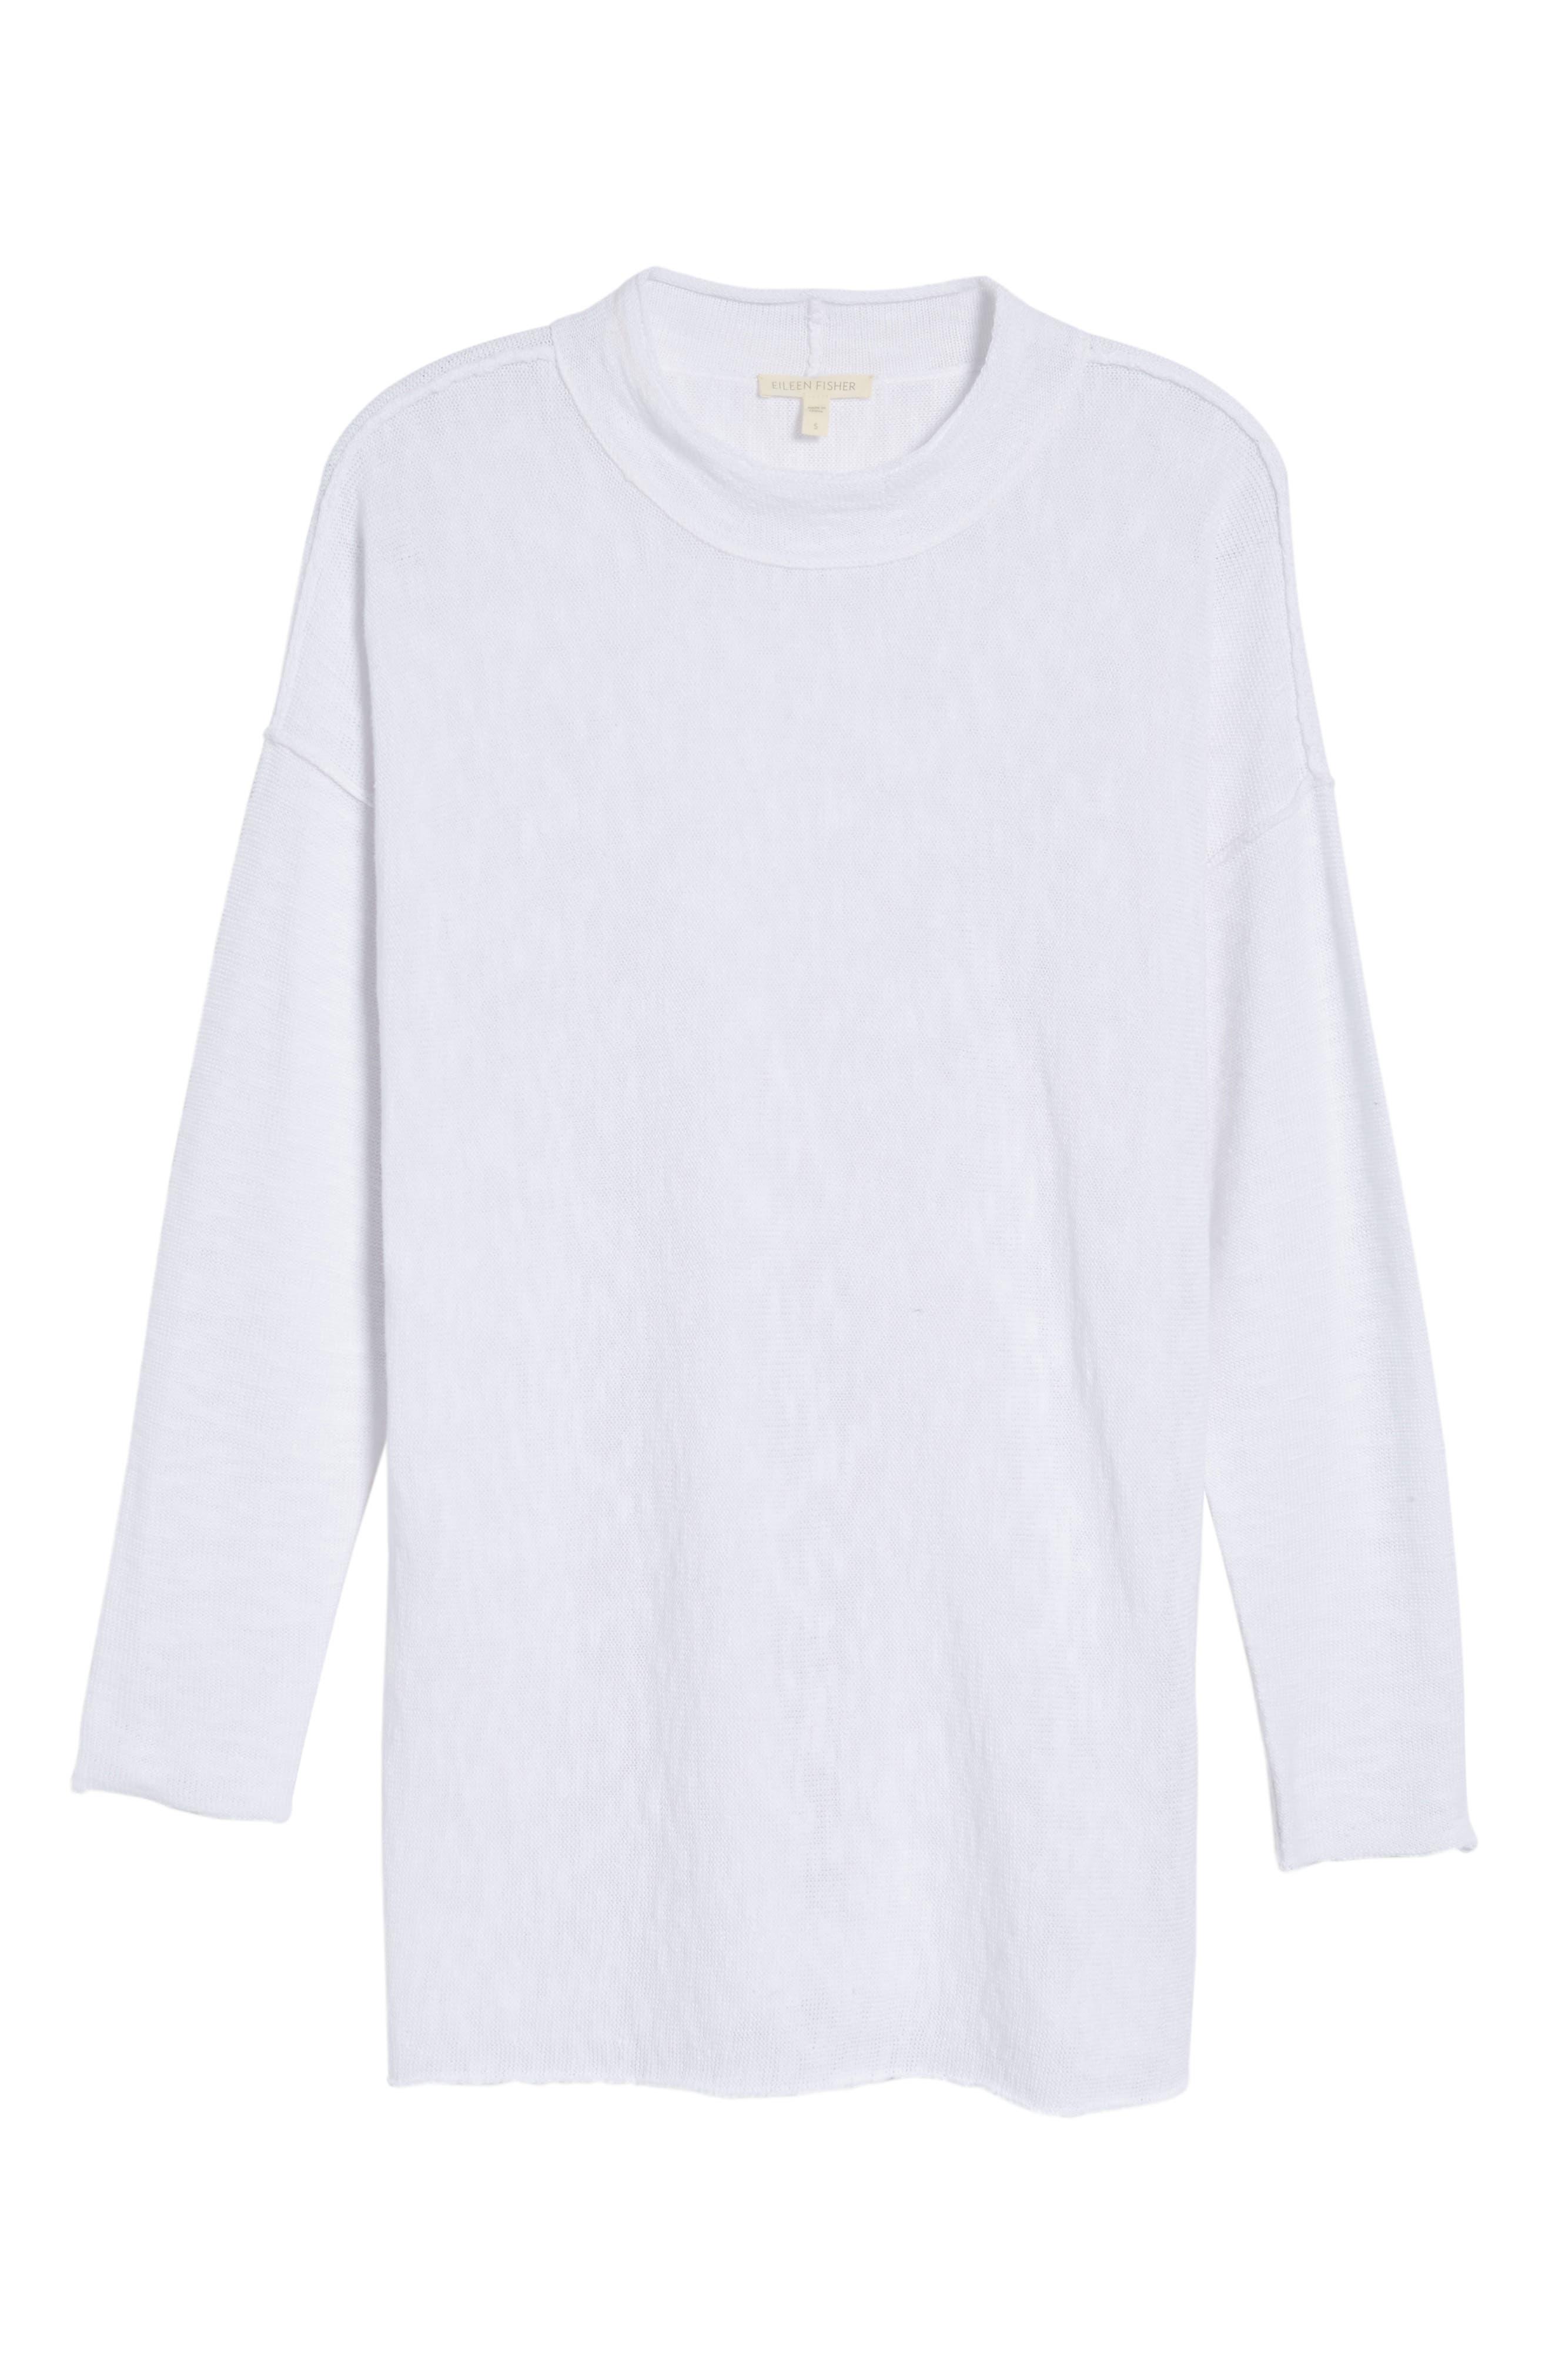 Organic Linen & Cotton Sweater,                             Alternate thumbnail 6, color,                             100